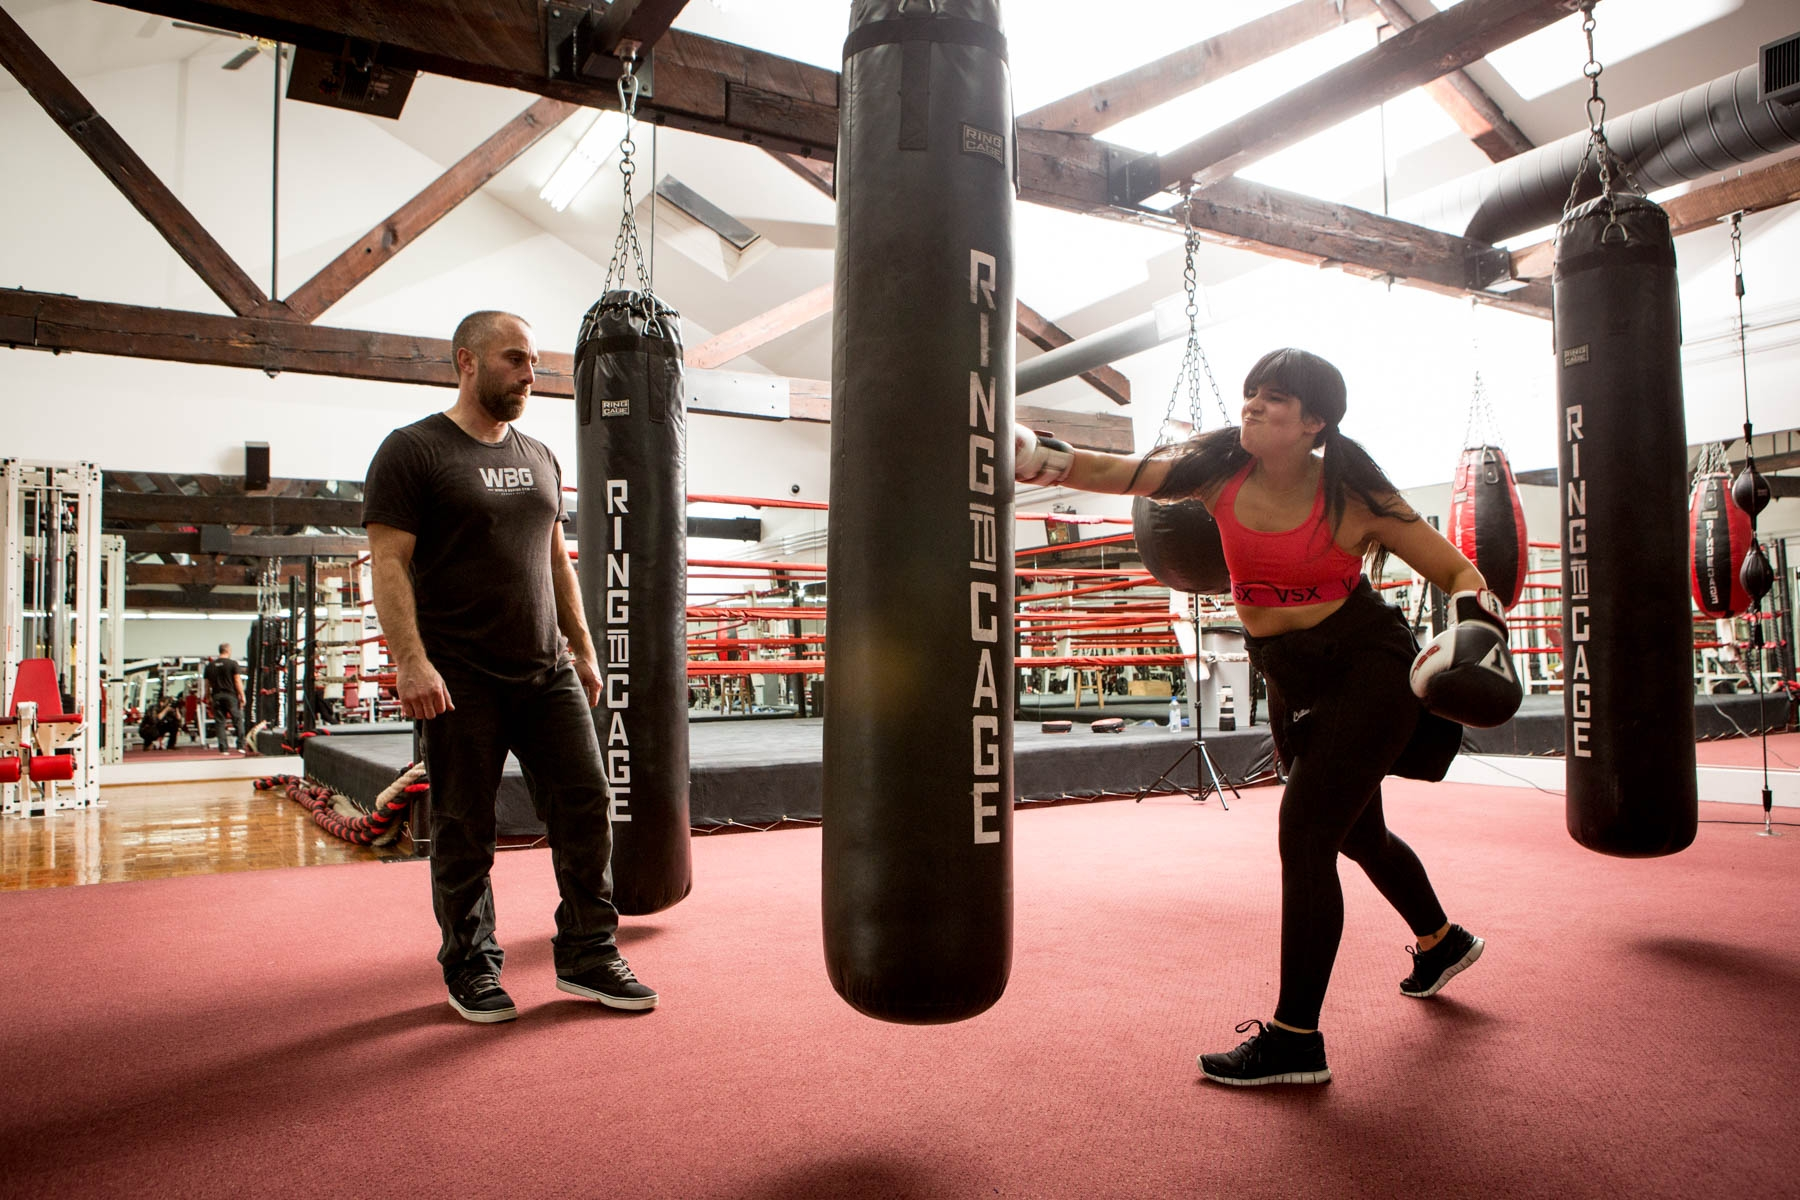 2017 12 1 Jersey City Nj World Boxing Gym Shot For Lynn Hazan